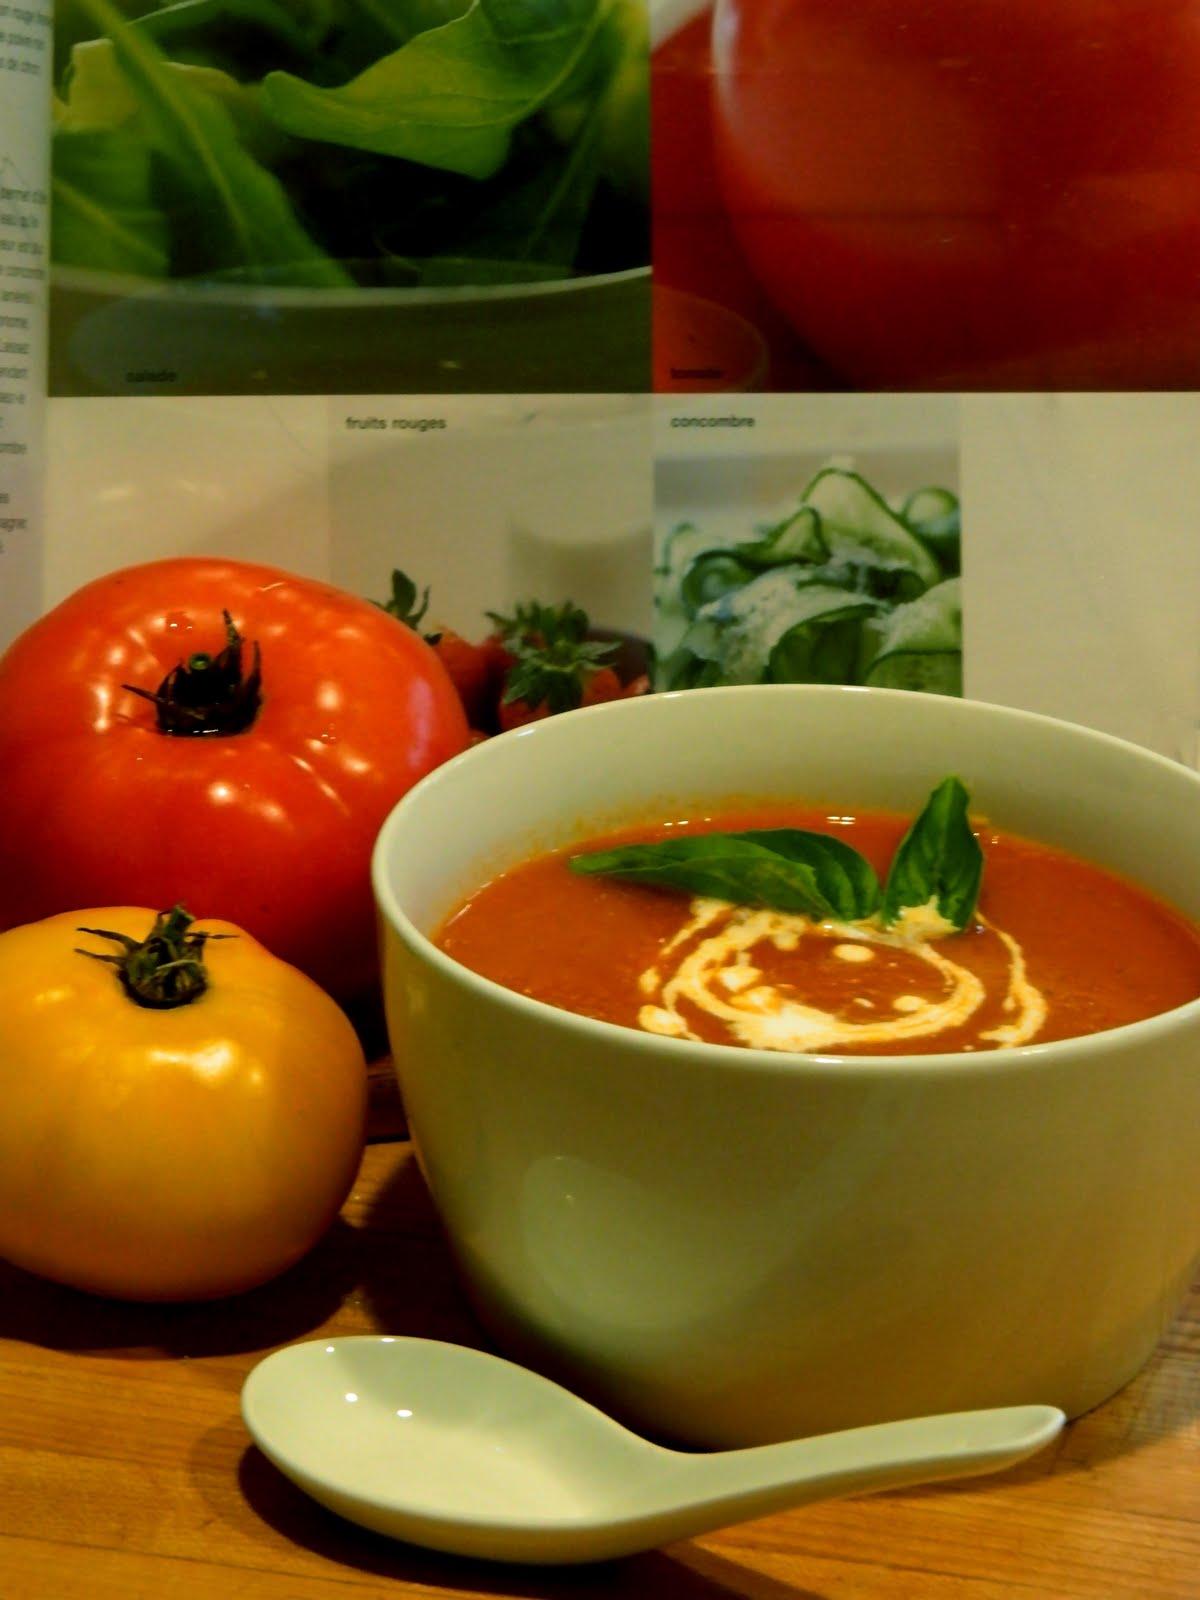 madame anne aux fourneaux soupe aux tomates fra ches. Black Bedroom Furniture Sets. Home Design Ideas